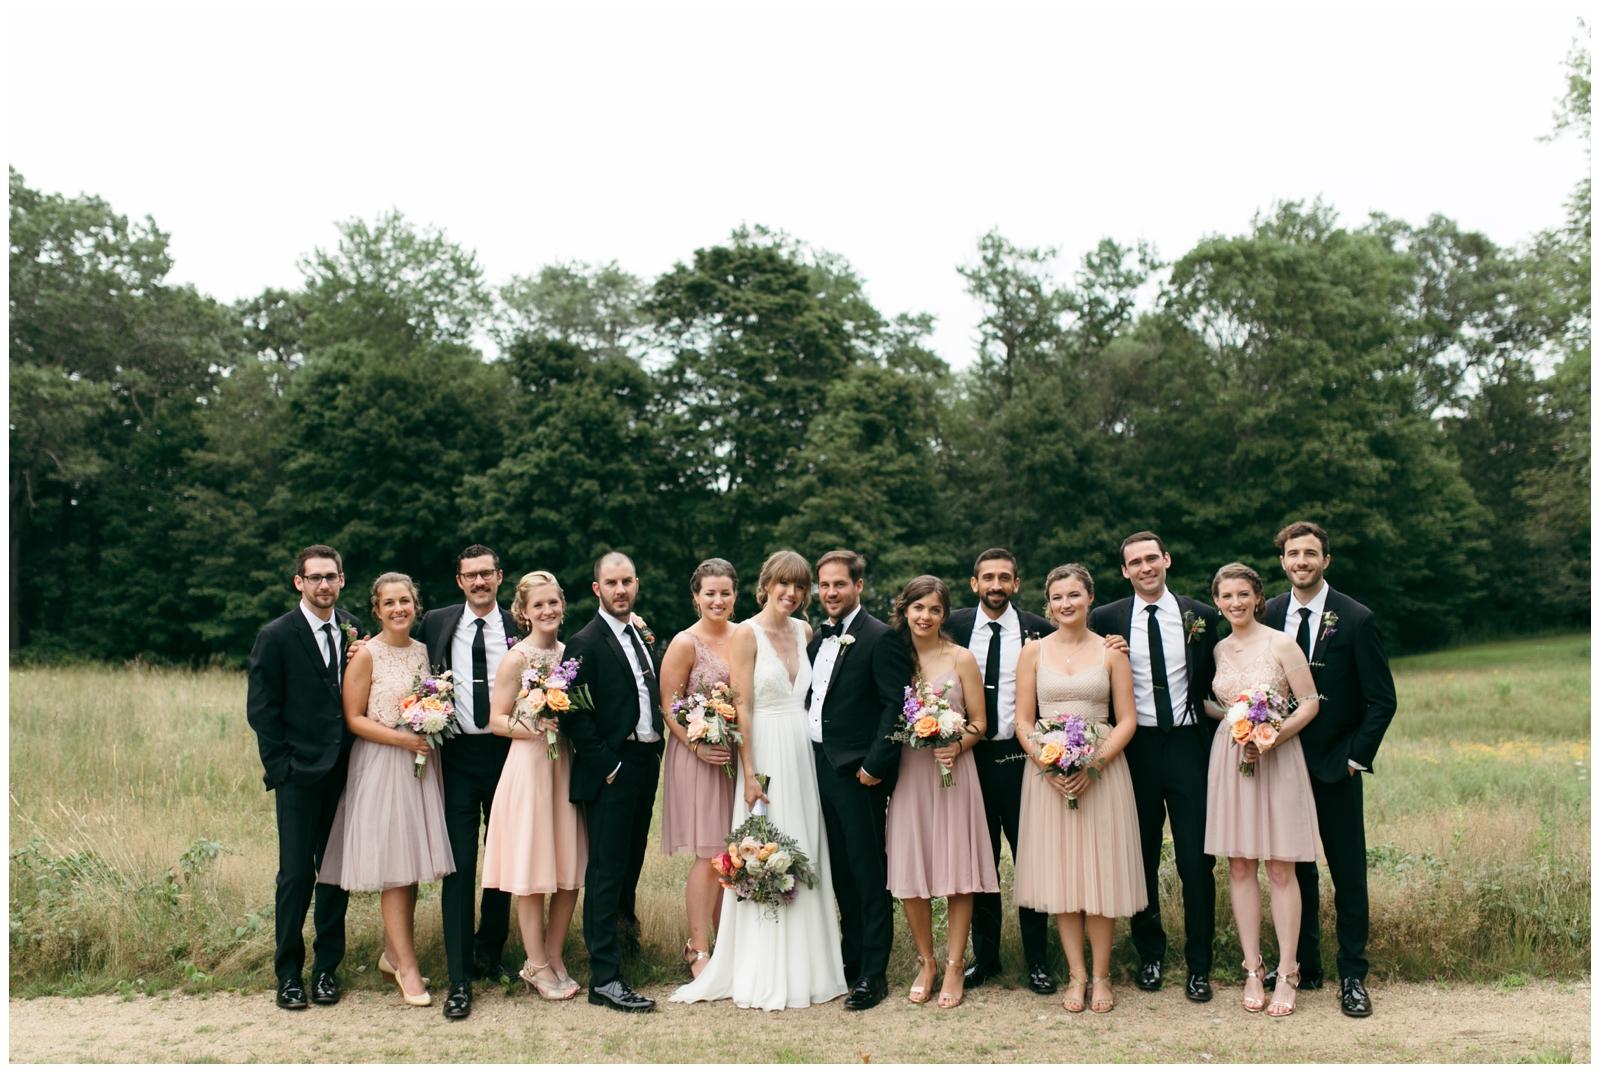 Moraine-Farm-wedding-Bailey-Q-Photo-Massachusetts-wedding-photpgrapher-034.jpg